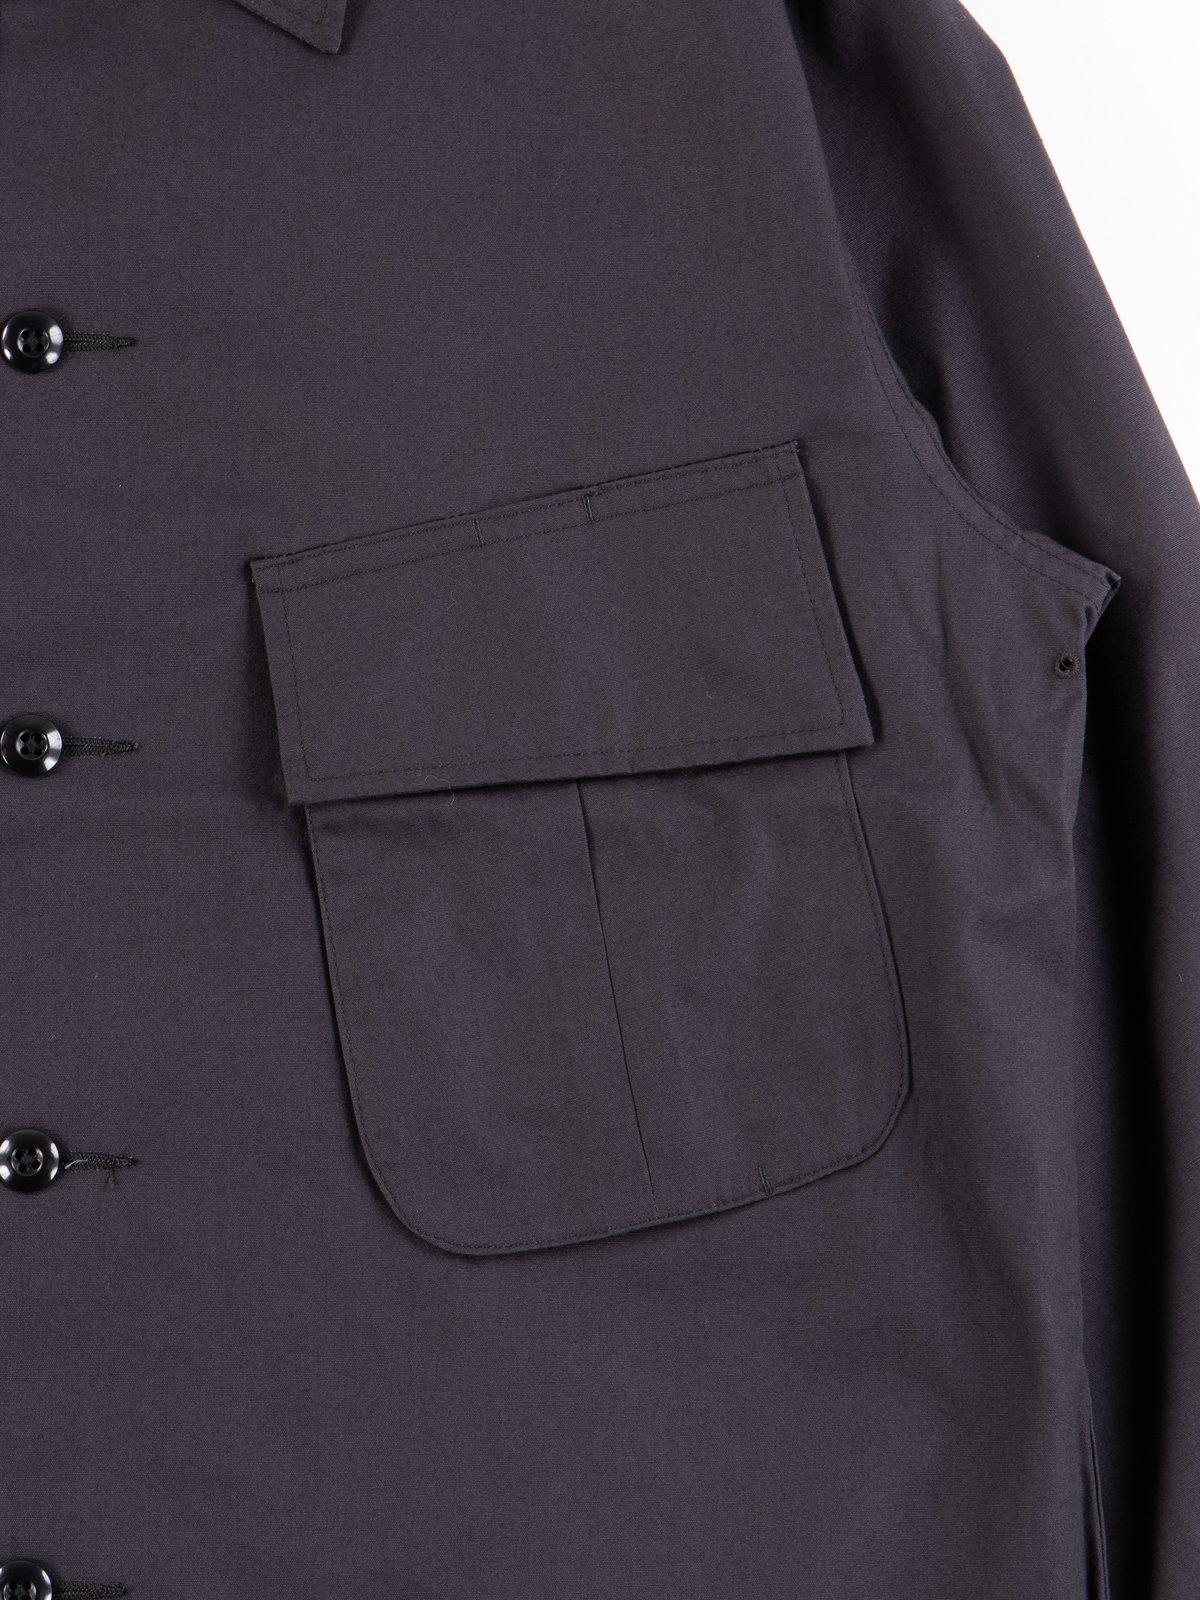 Fade Black Selvedge Poplin Cotton Combat Short Jacket - Image 4